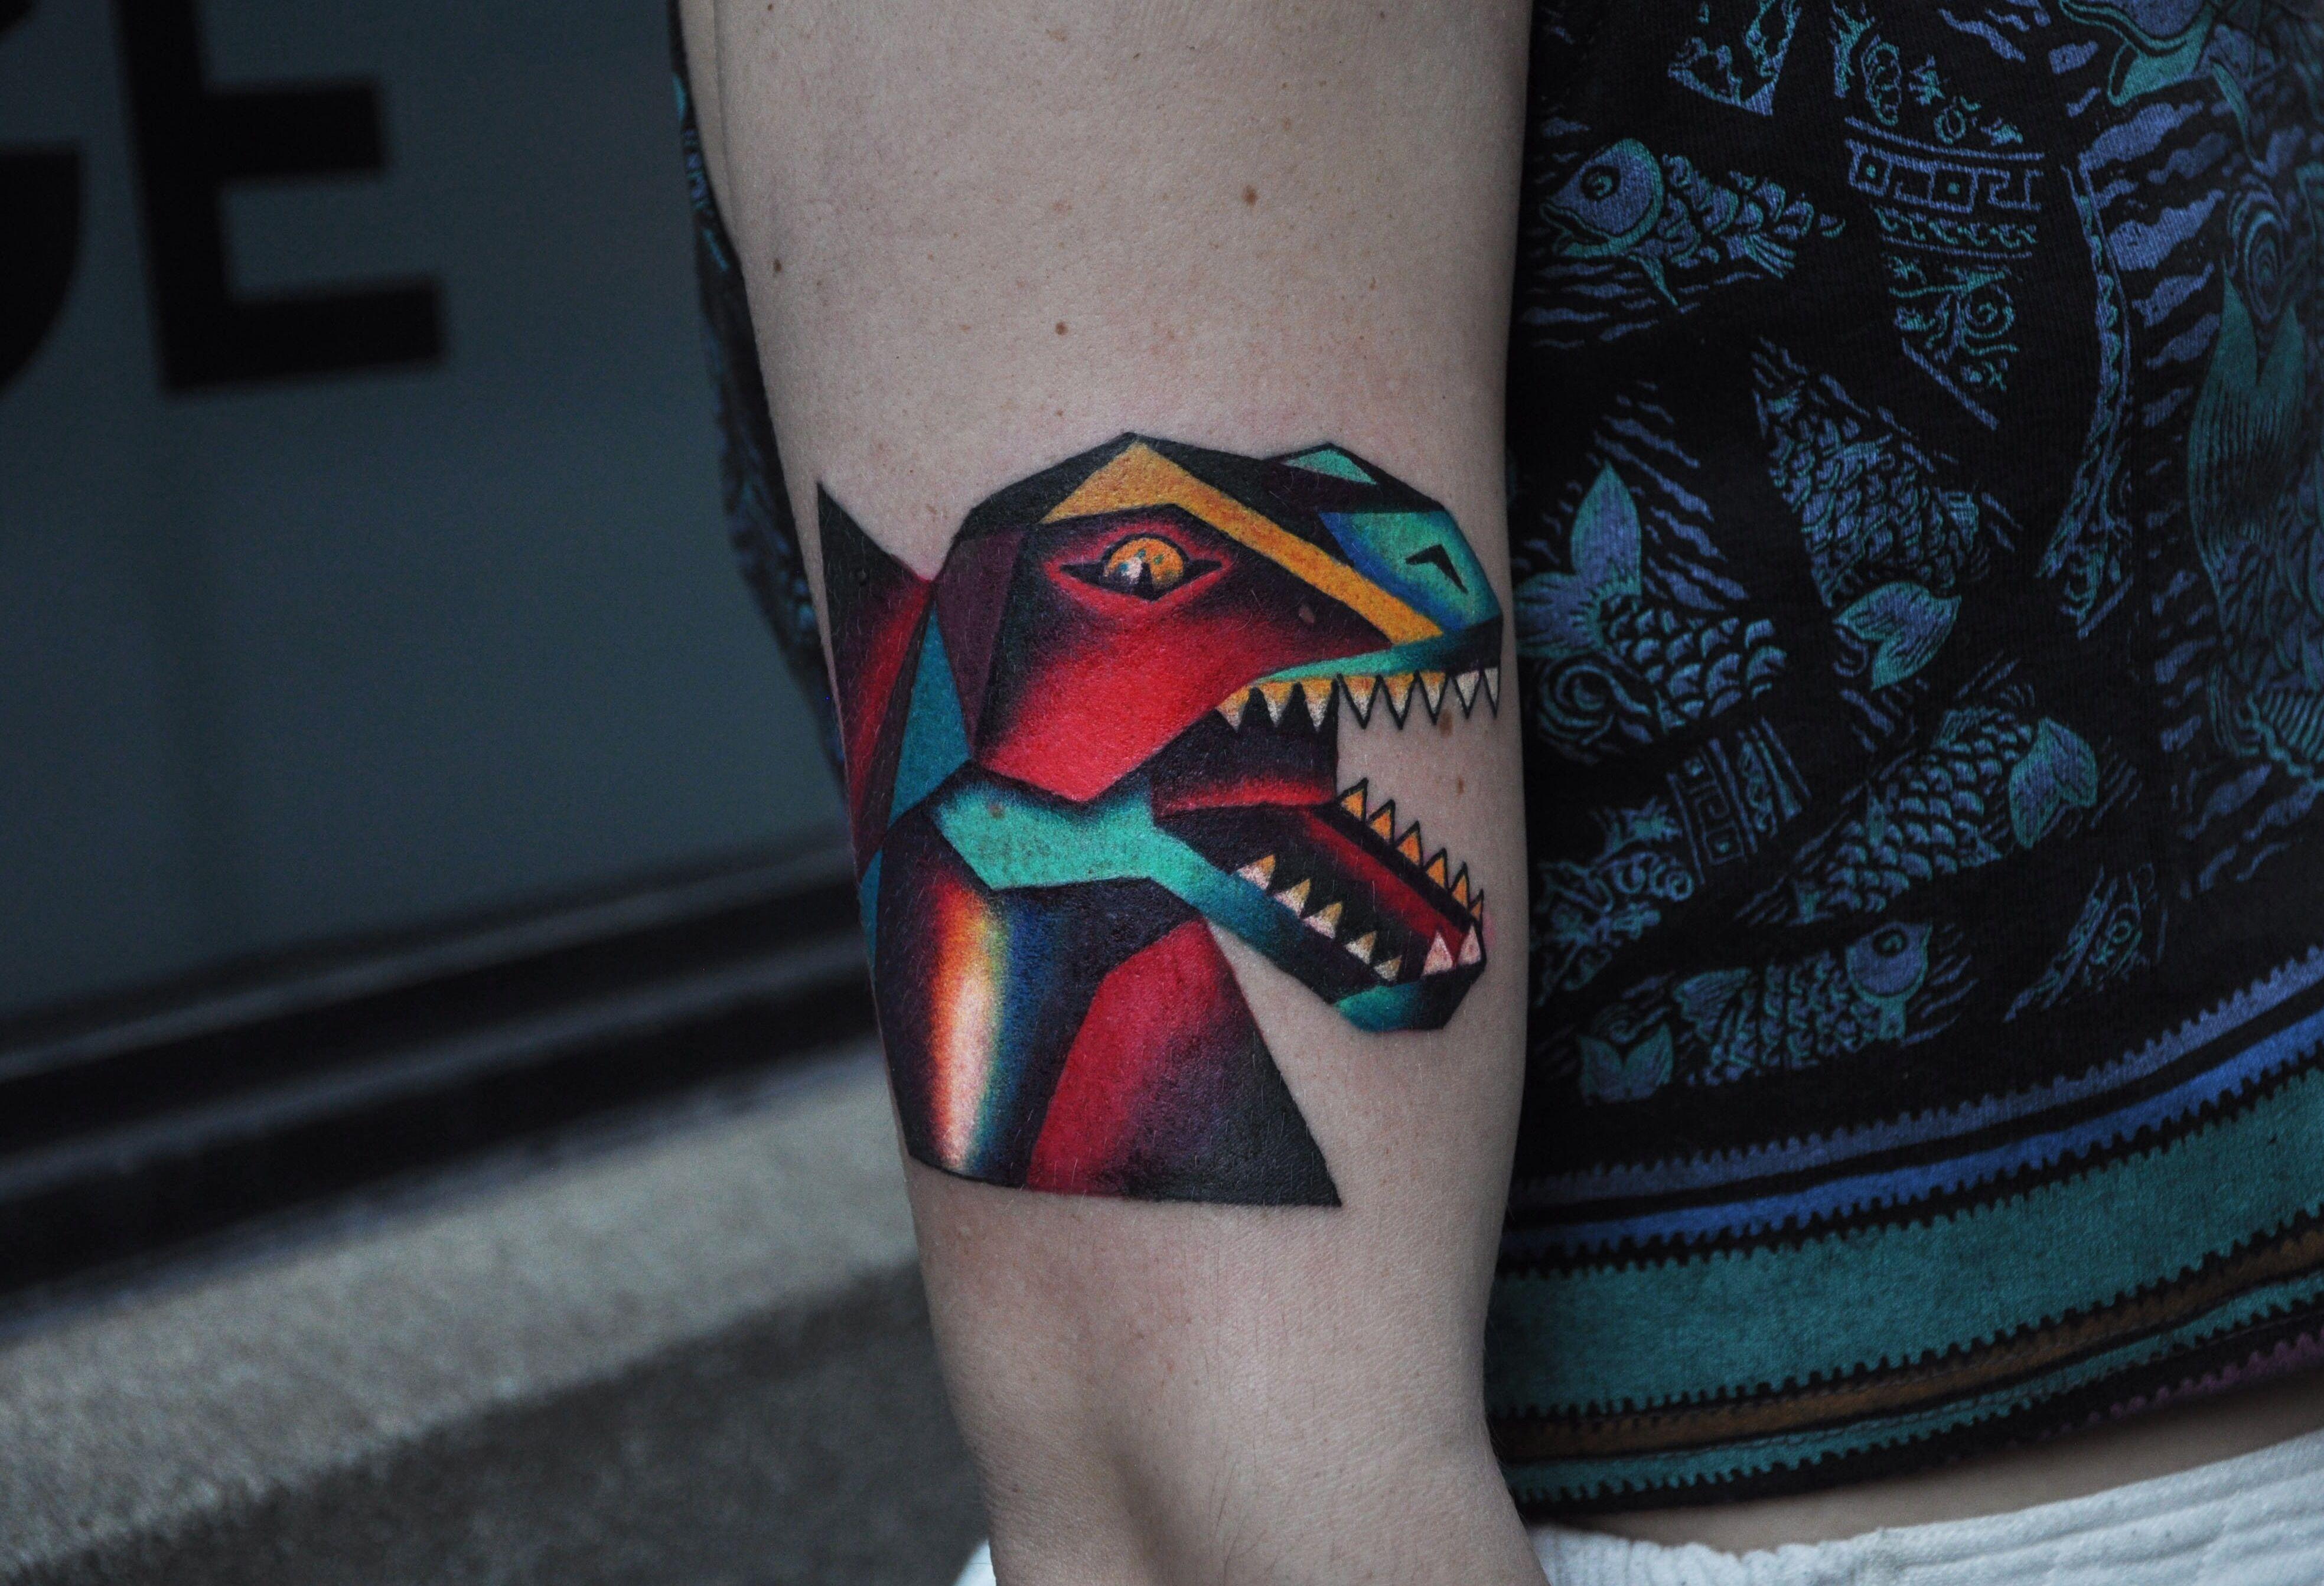 TRex tattoo by David Cote, Imperial Tattoo Connexion